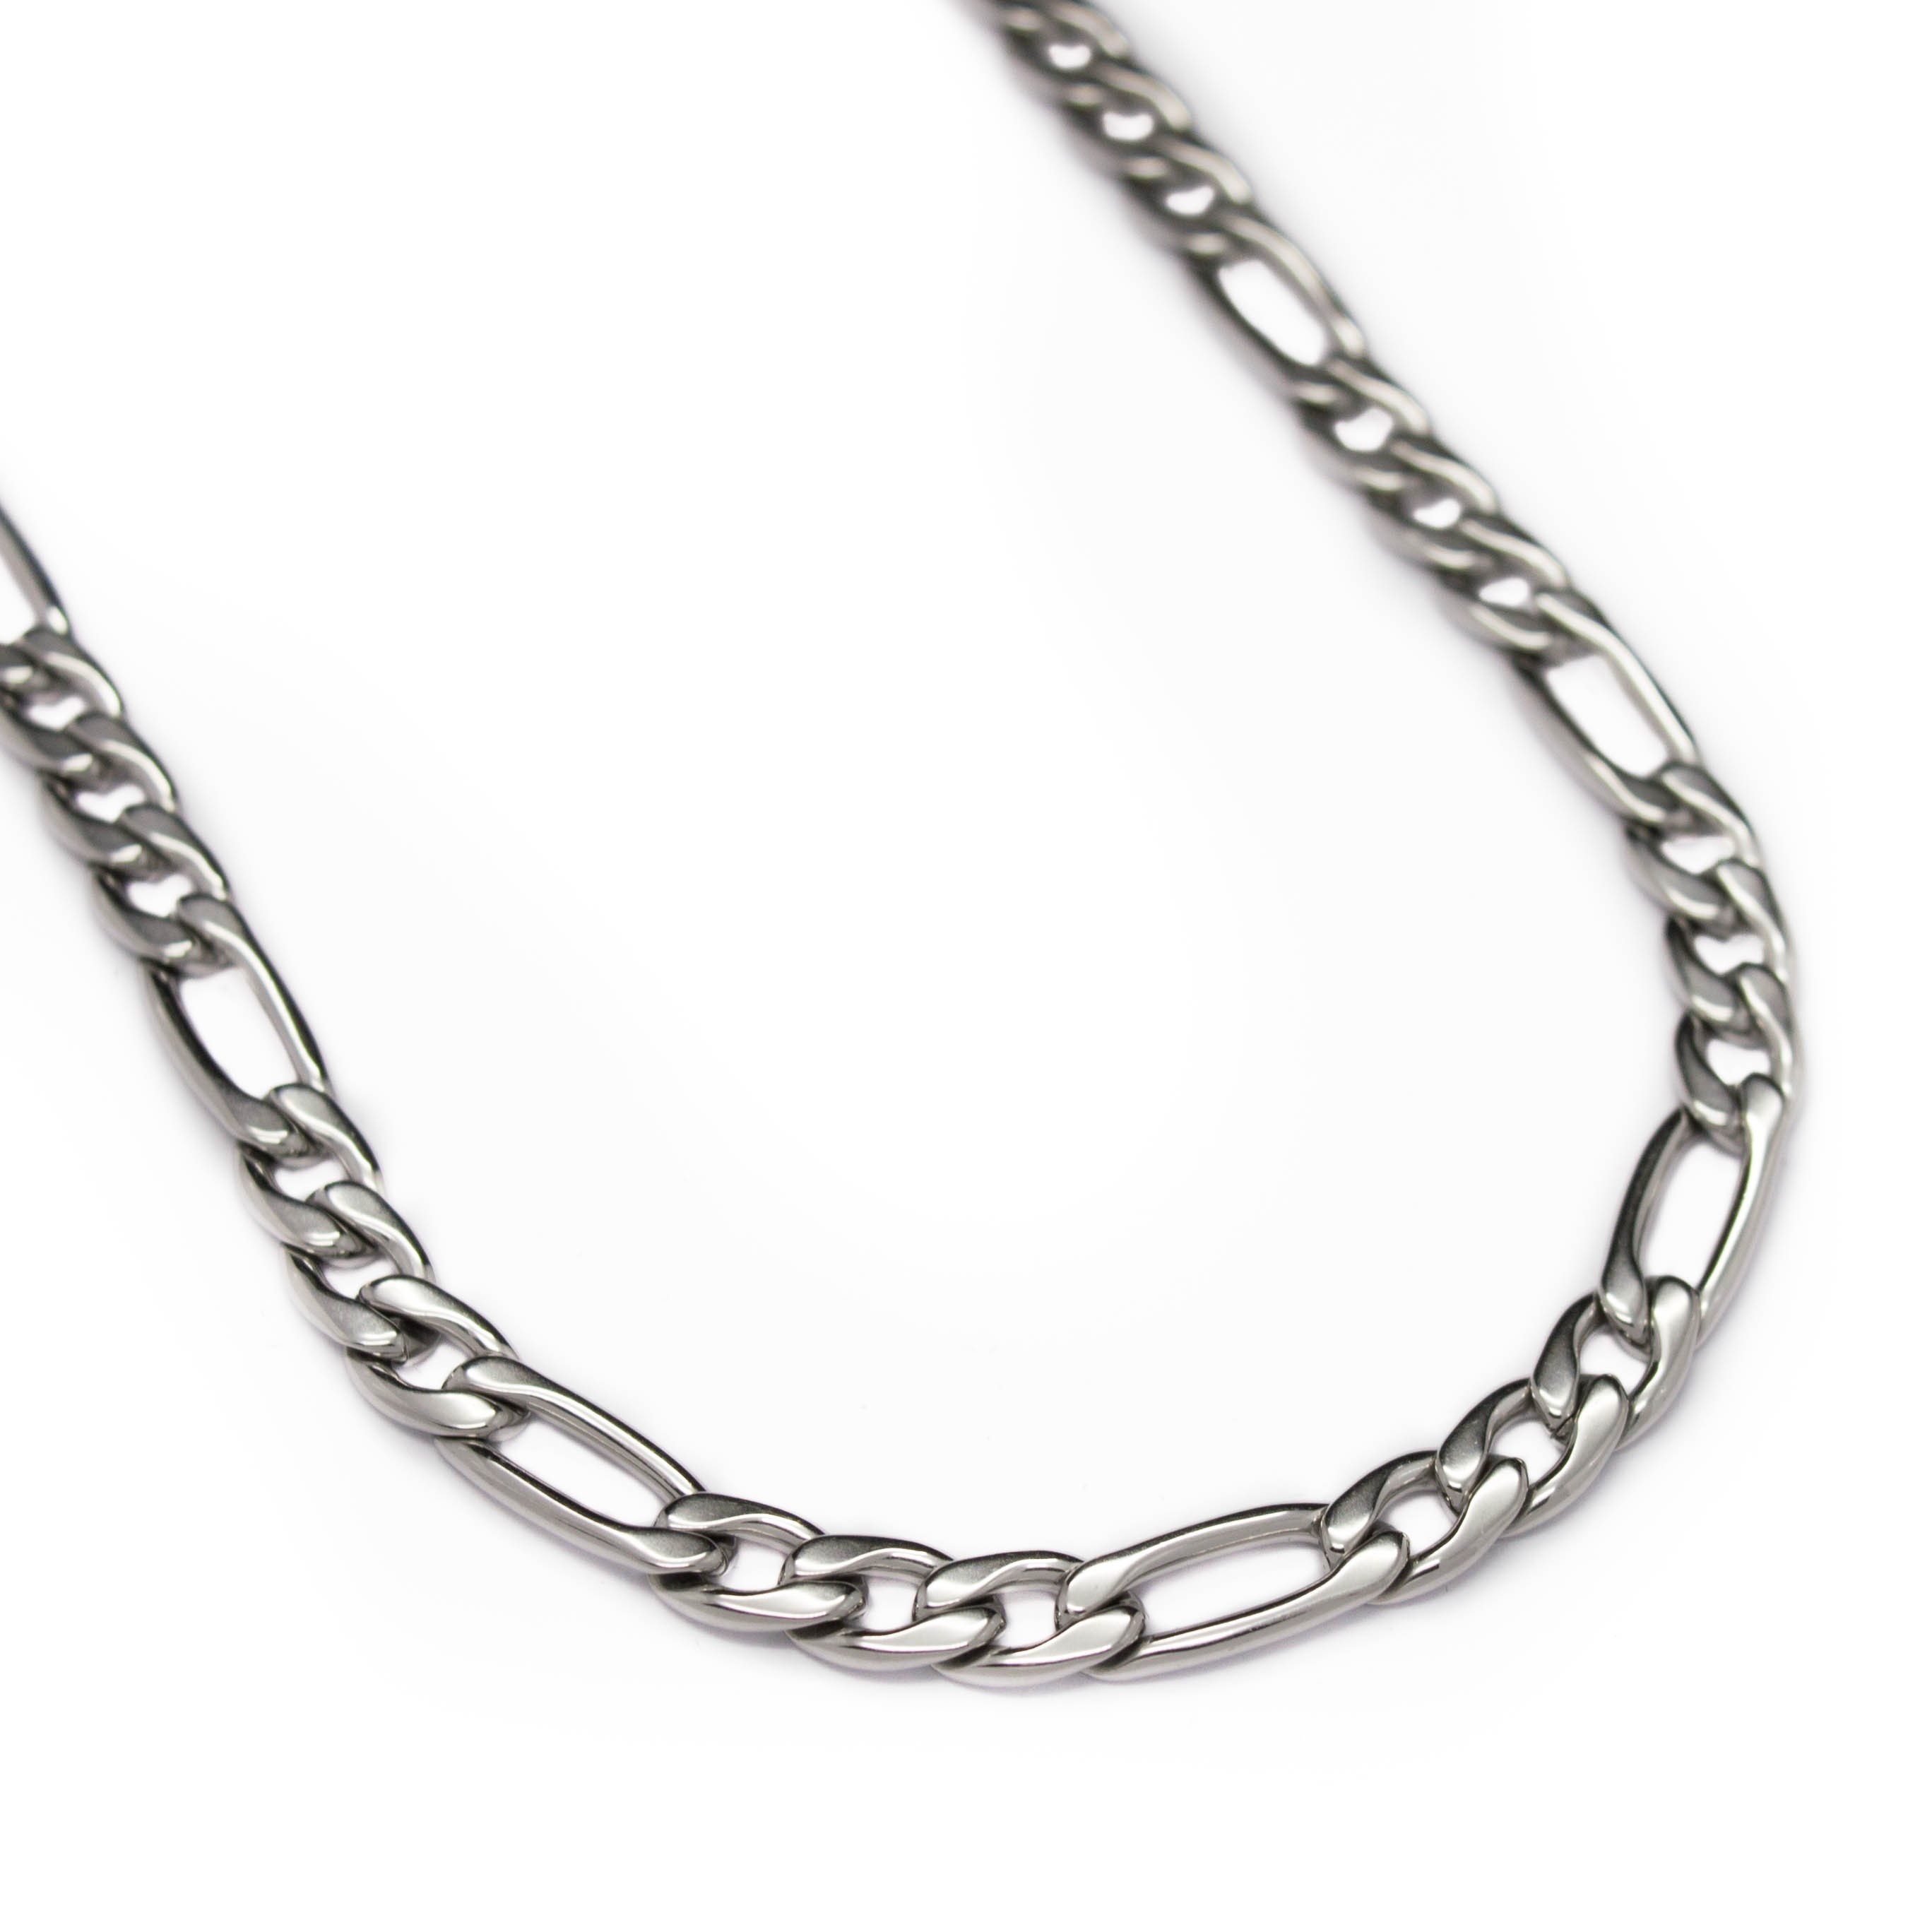 bracelet pour homme stainless steel bijoux la mode. Black Bedroom Furniture Sets. Home Design Ideas